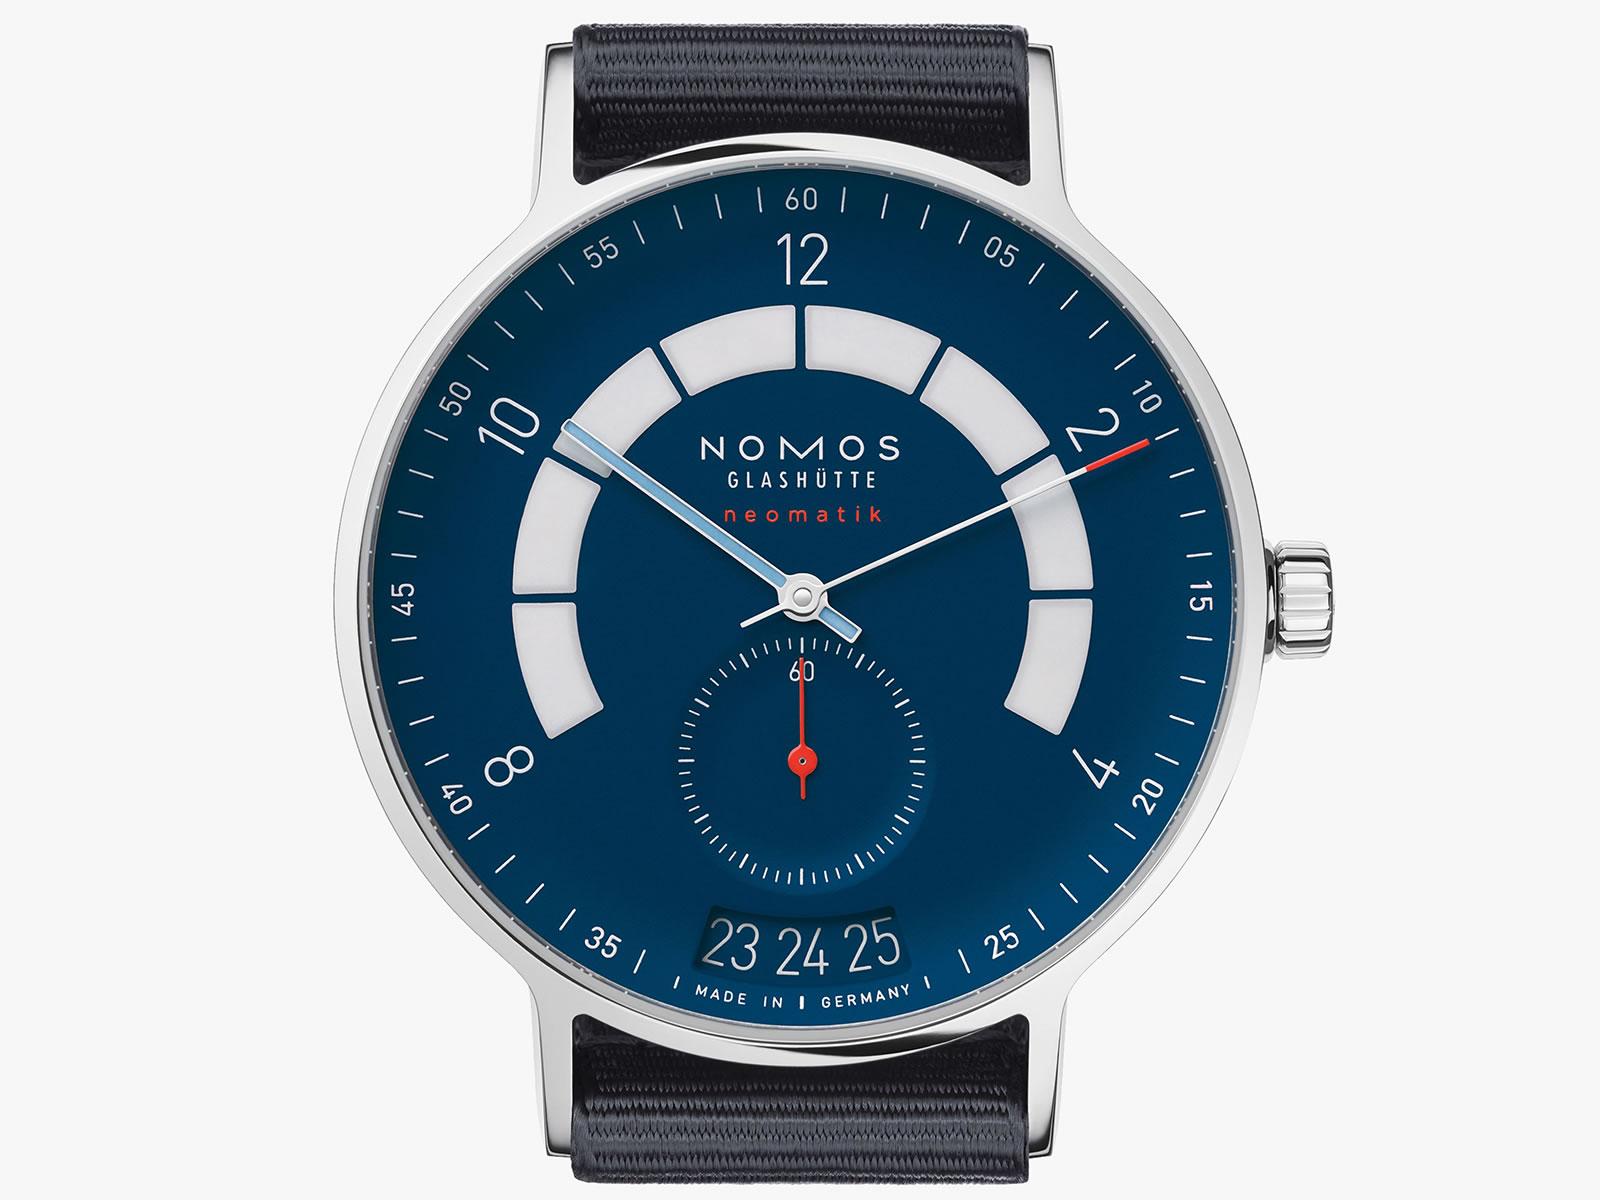 1302-nomos-glashutte-autobahn-neomatik-41-date-midnight-blue-.jpg